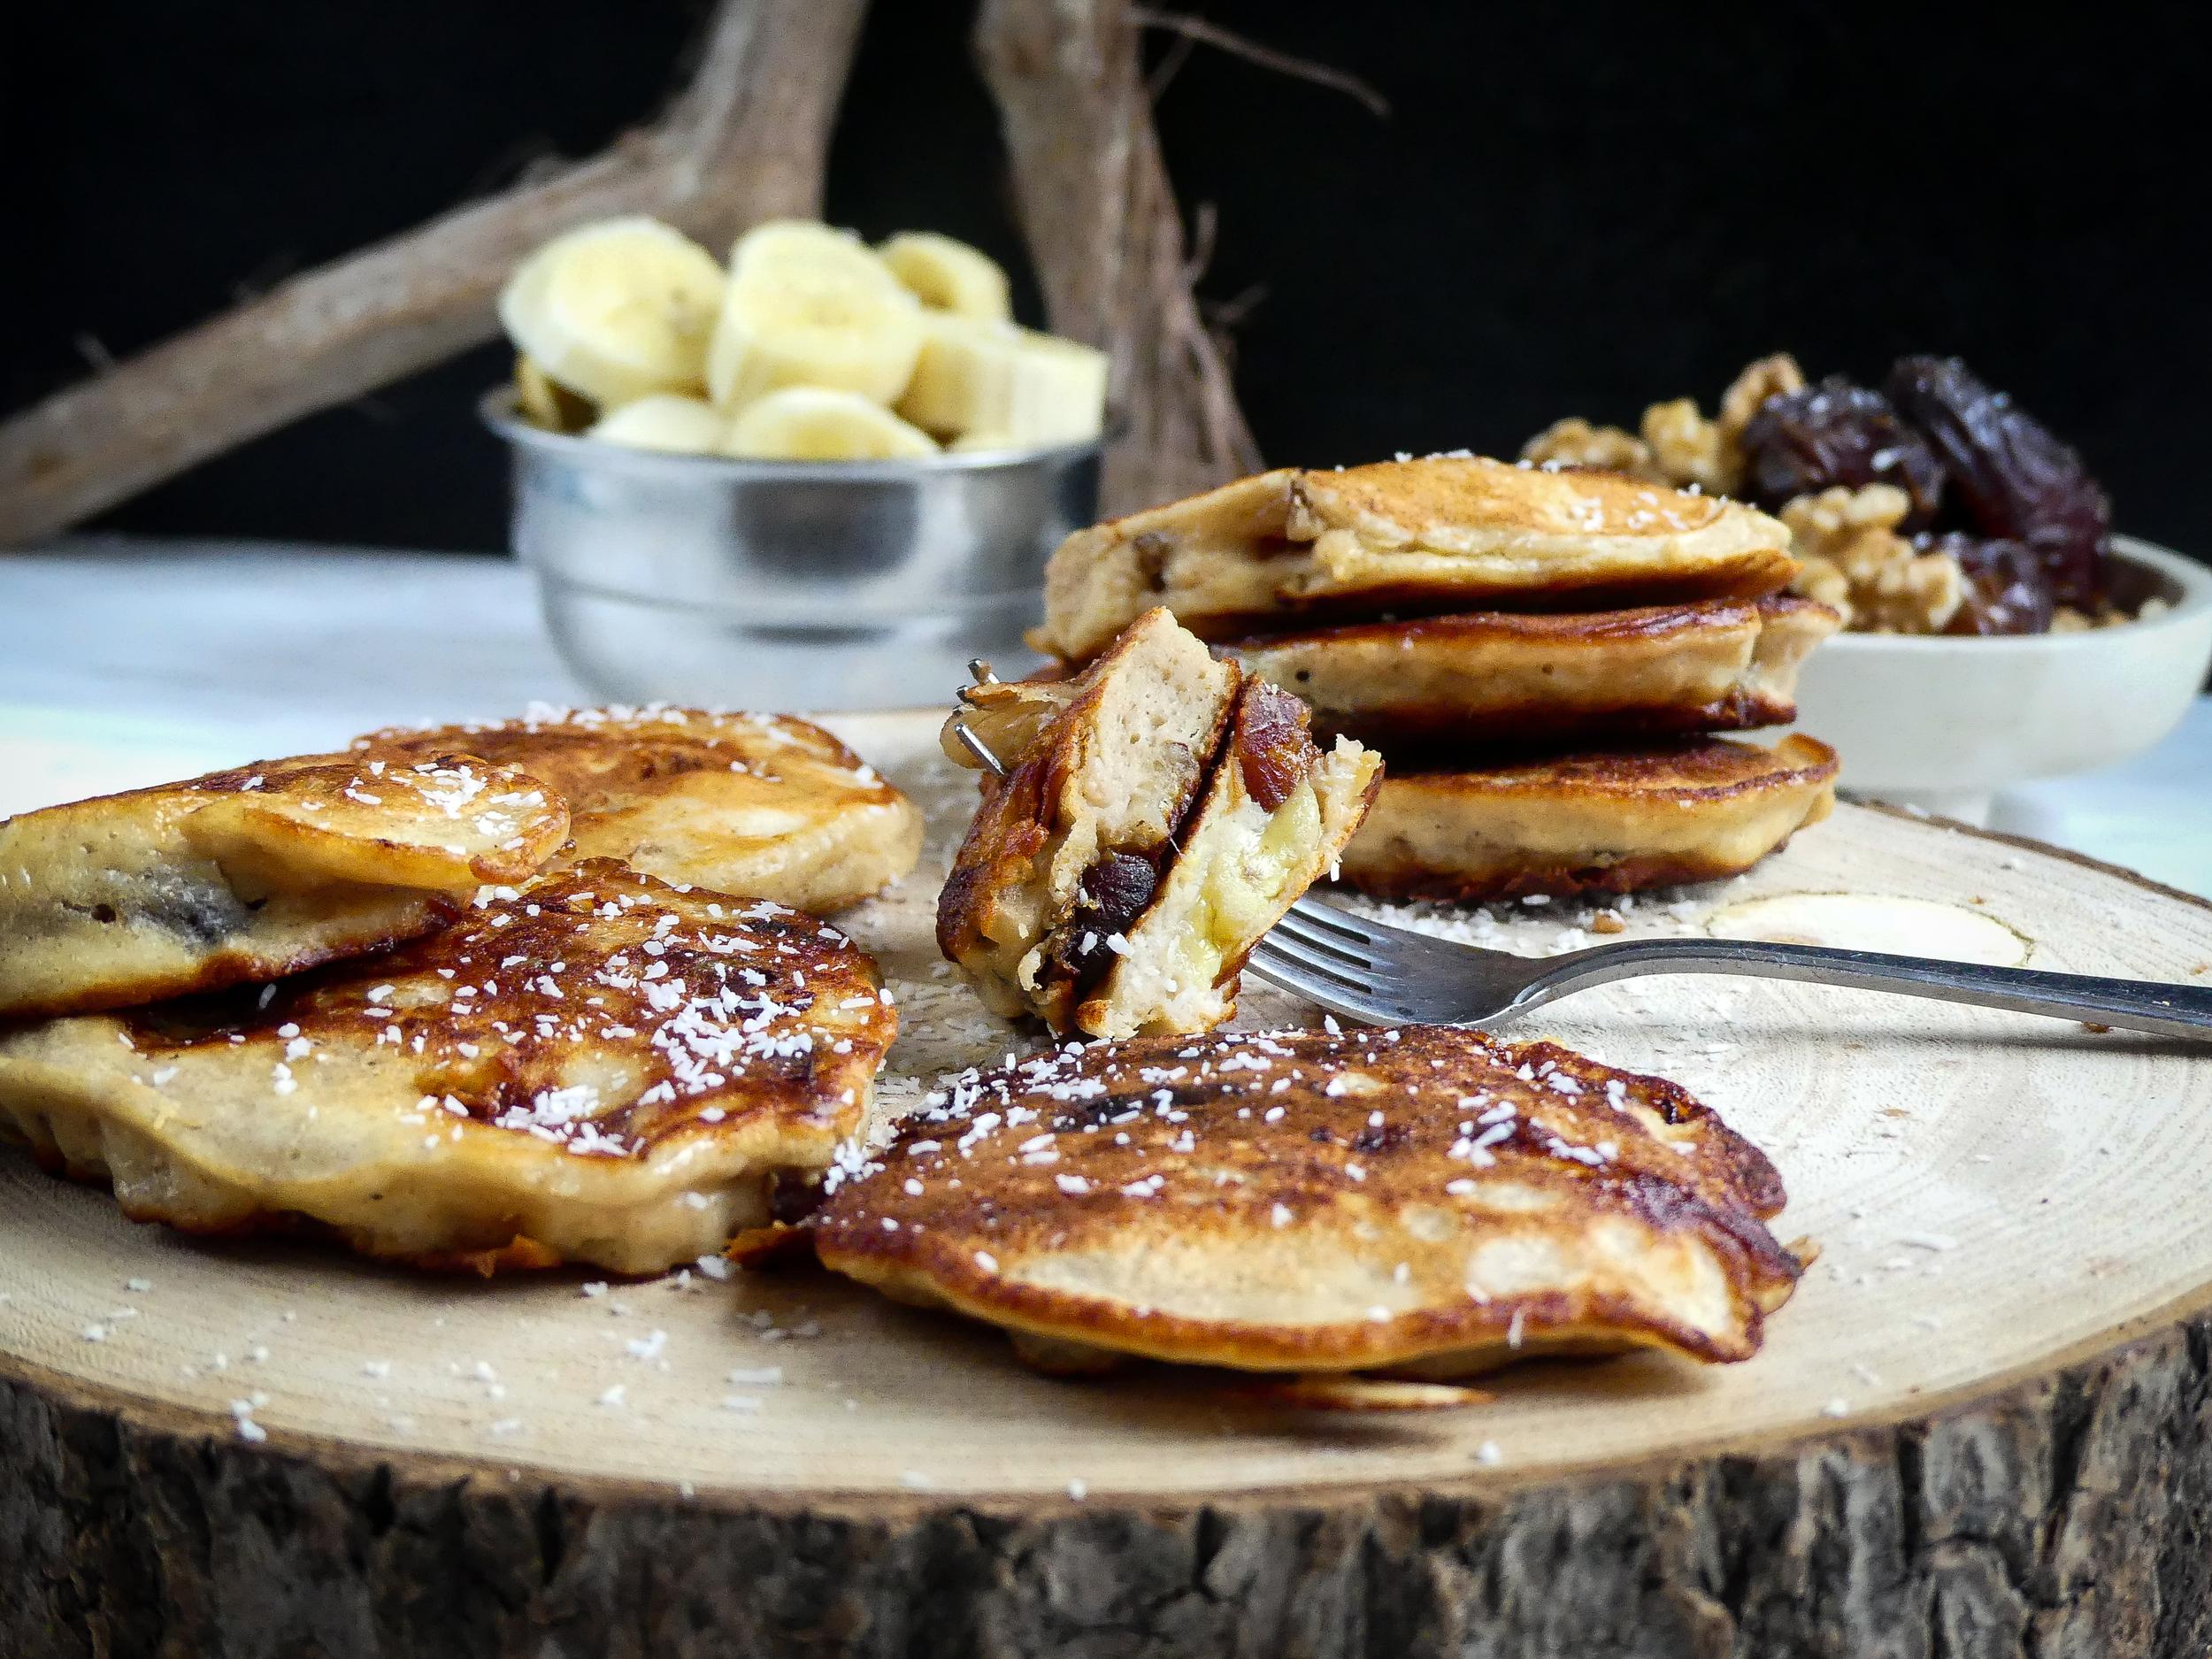 Banana, dates & walnut pancakes